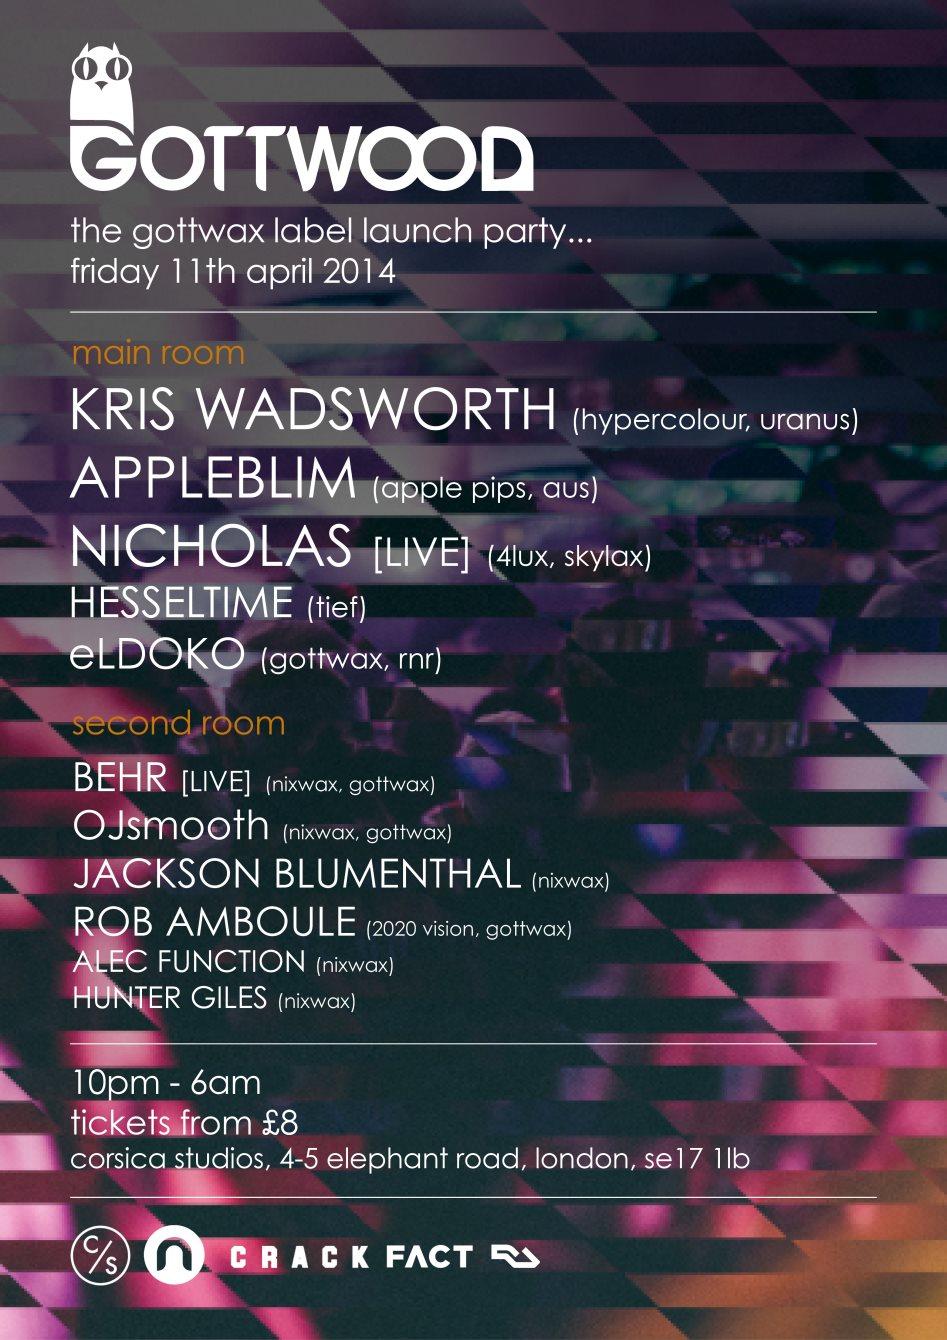 Gottwood presents: The Gottwax Label Launch Feat. Kris Wadsworth, Appleblim, Nicholas (Live) - Flyer front